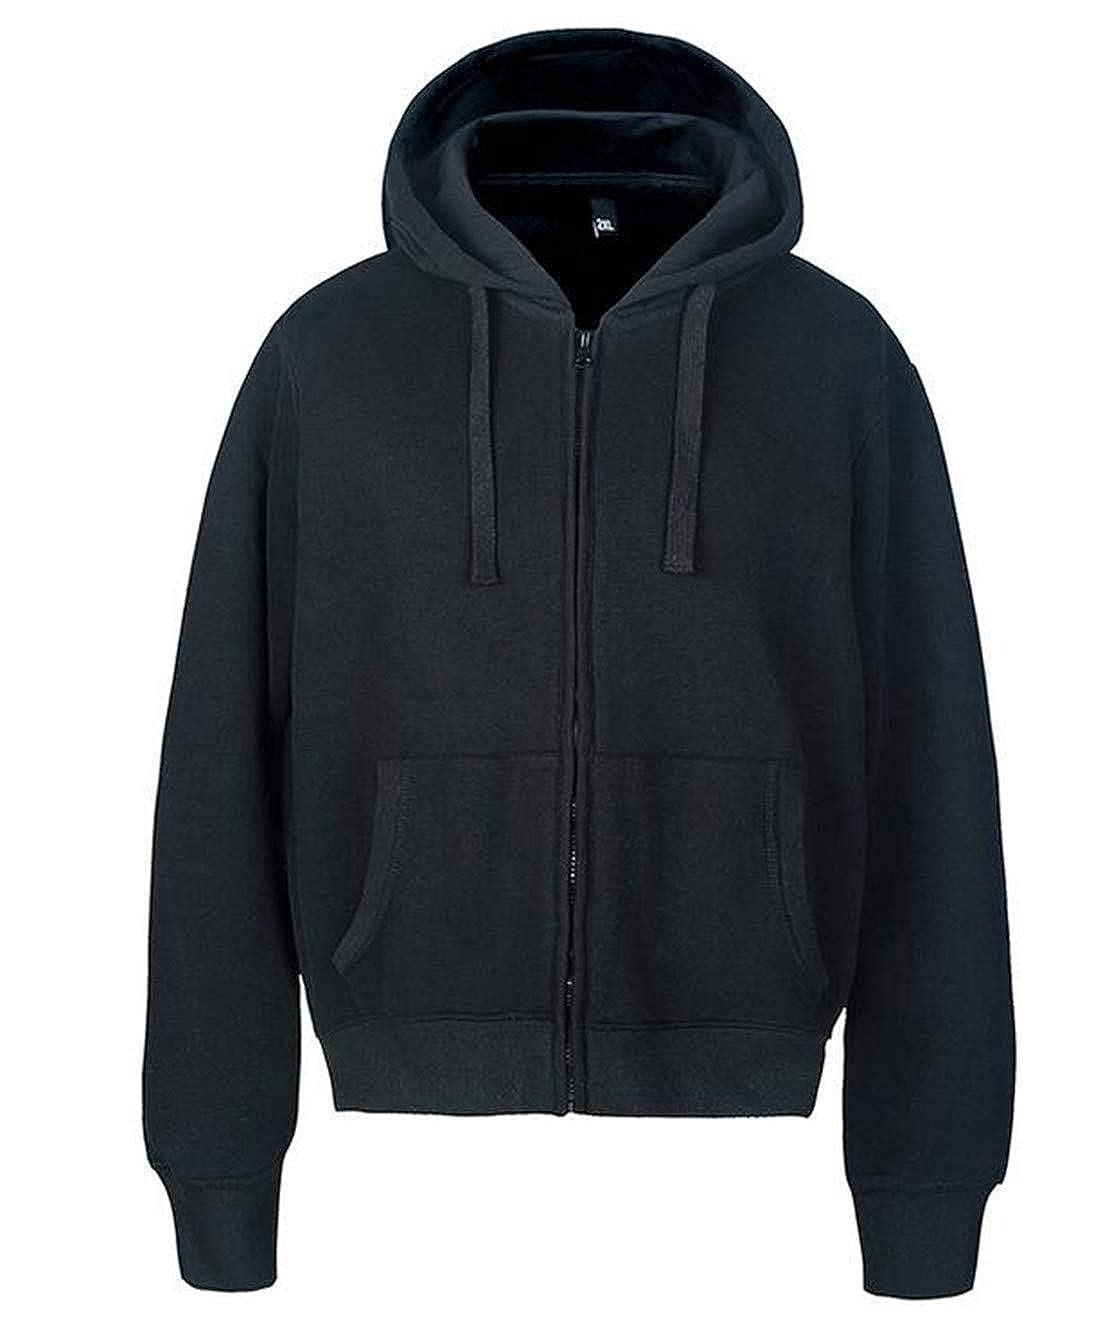 JXG Men Full-Zip Warm Sherpa Lined Polar Fleece Hoodie Jacket Sweatshirt